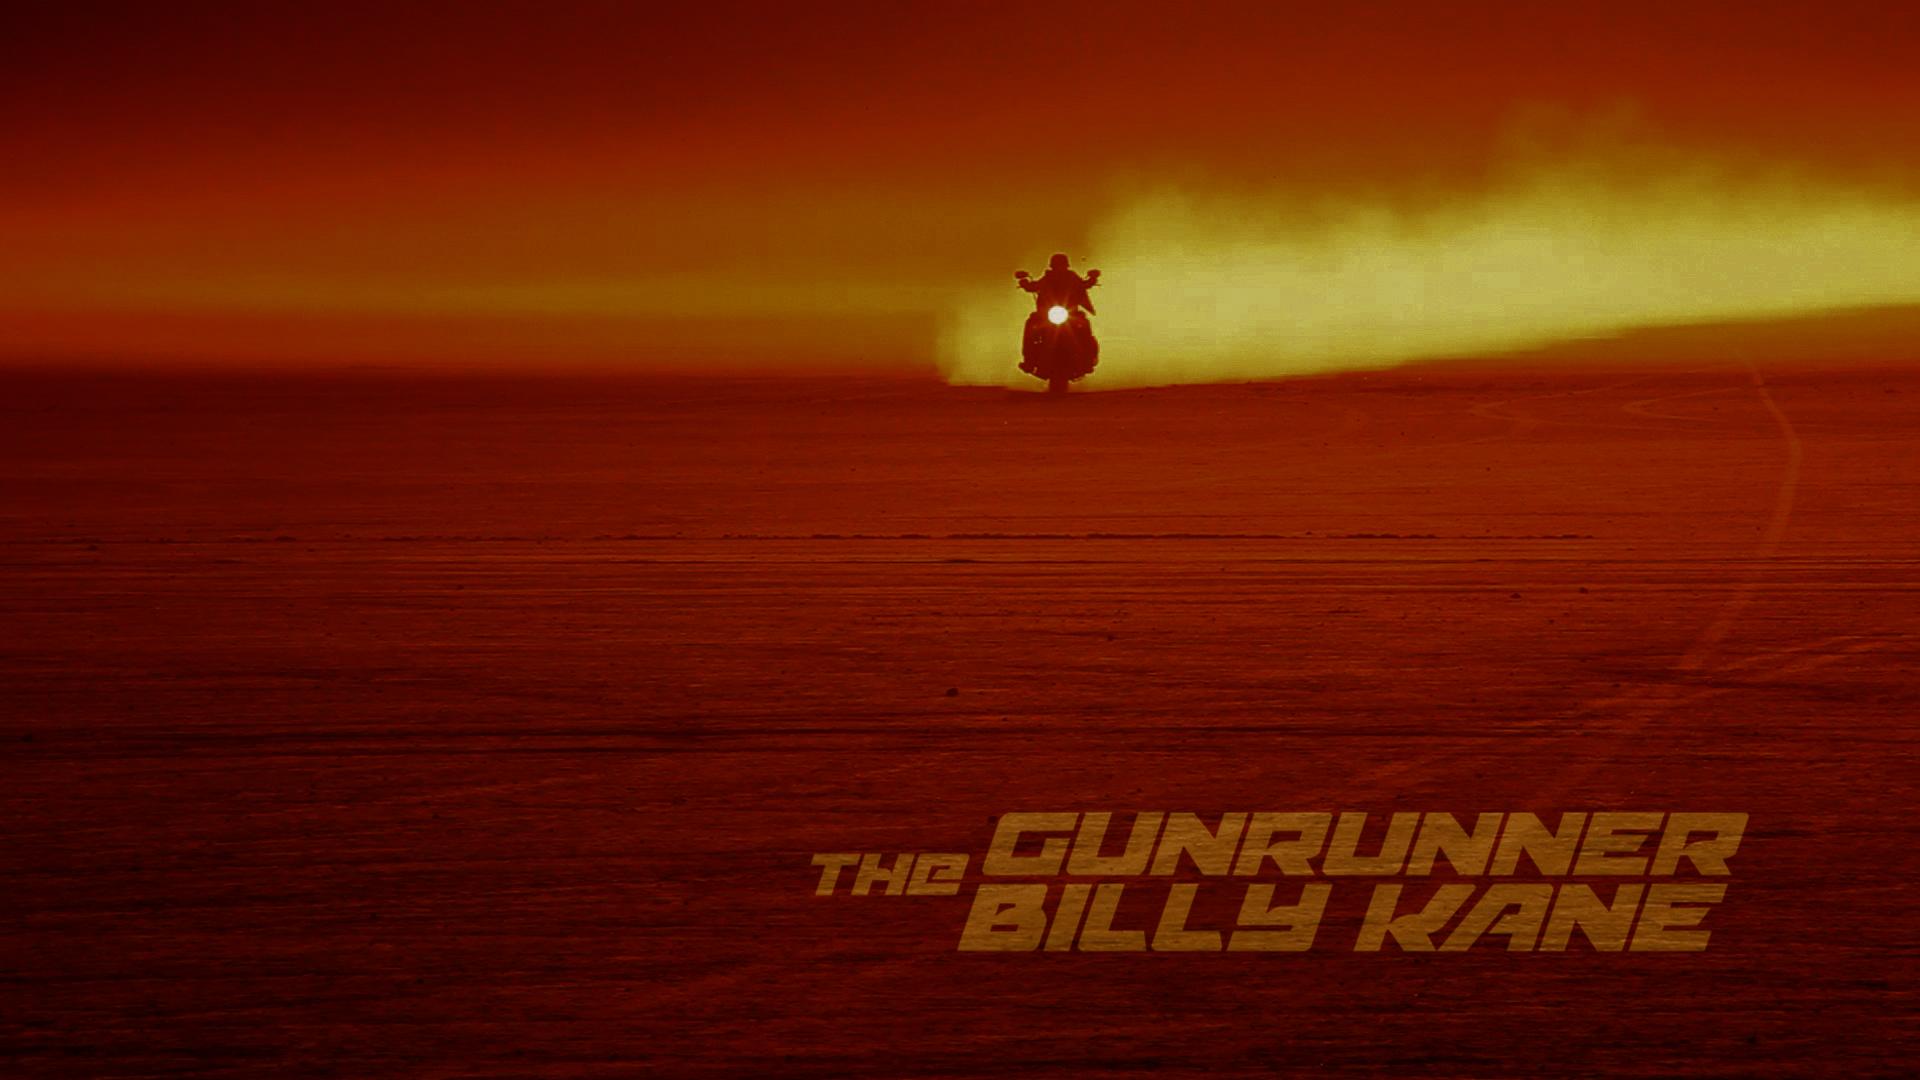 The Gunrunner Billy Kane (Japanese version) - Season 1